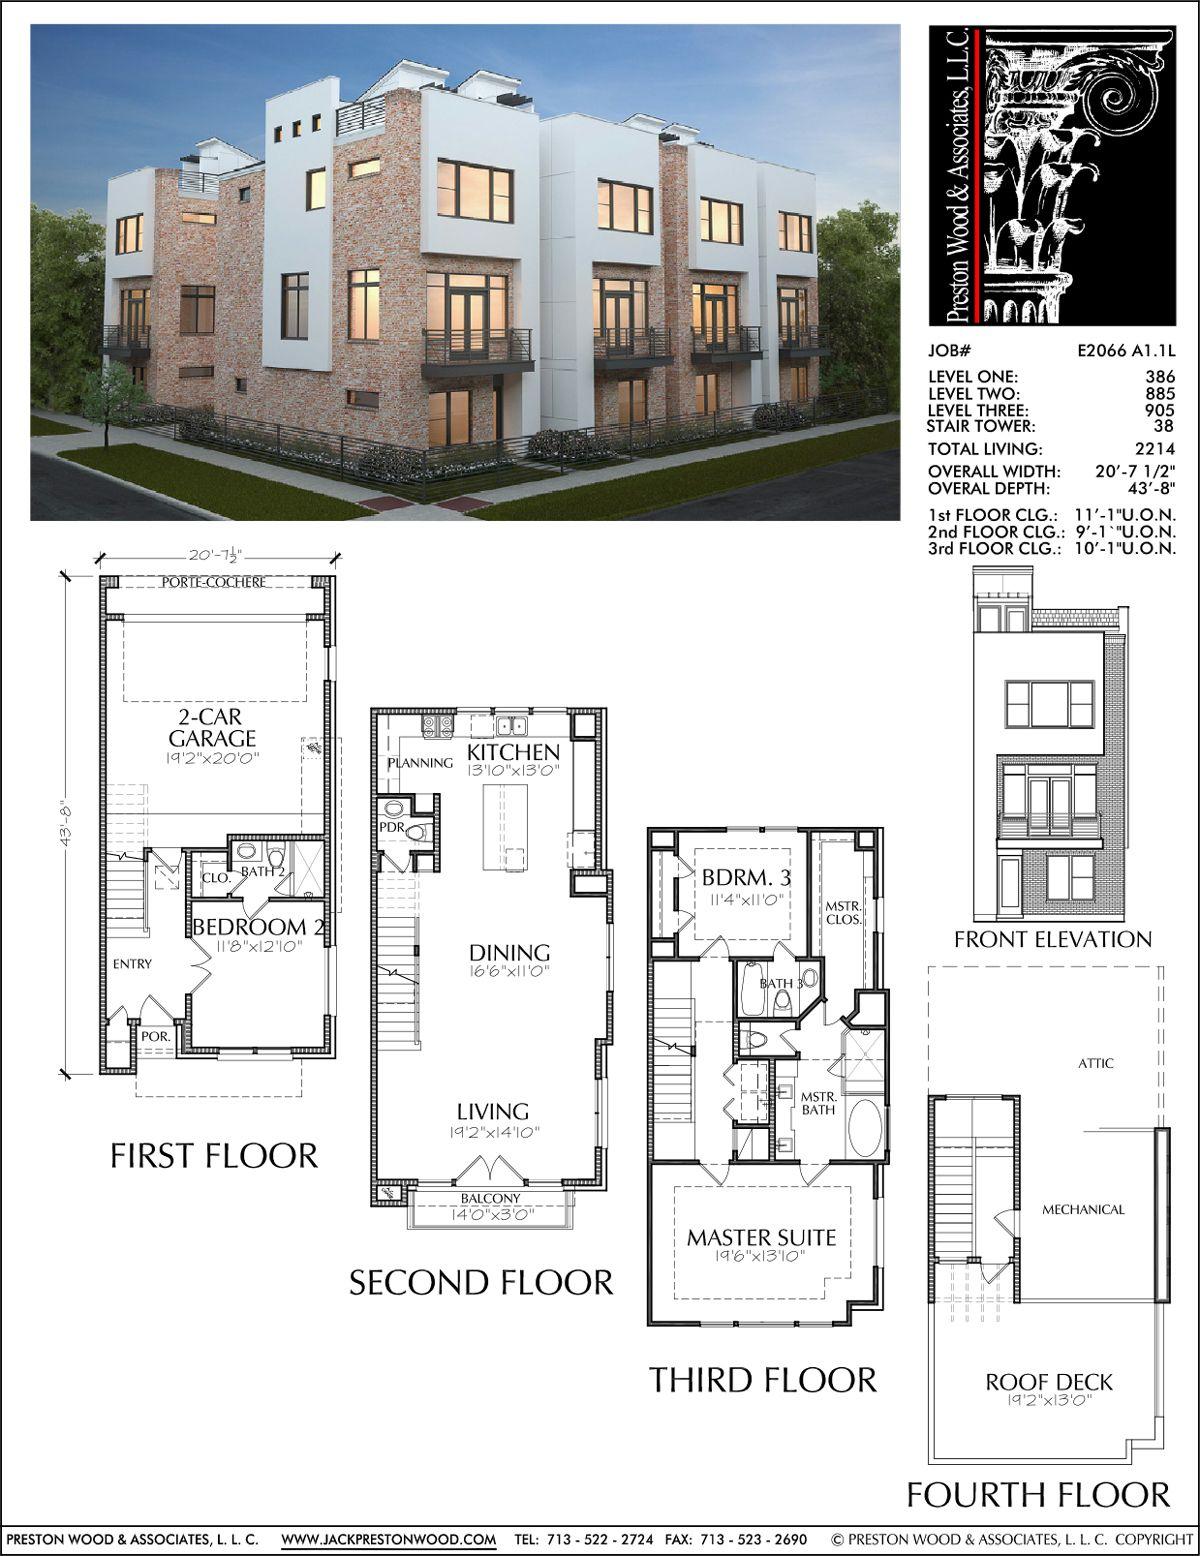 3 1 2 Story Townhouse Plan E2066 A1 1 Town House Floor Plan